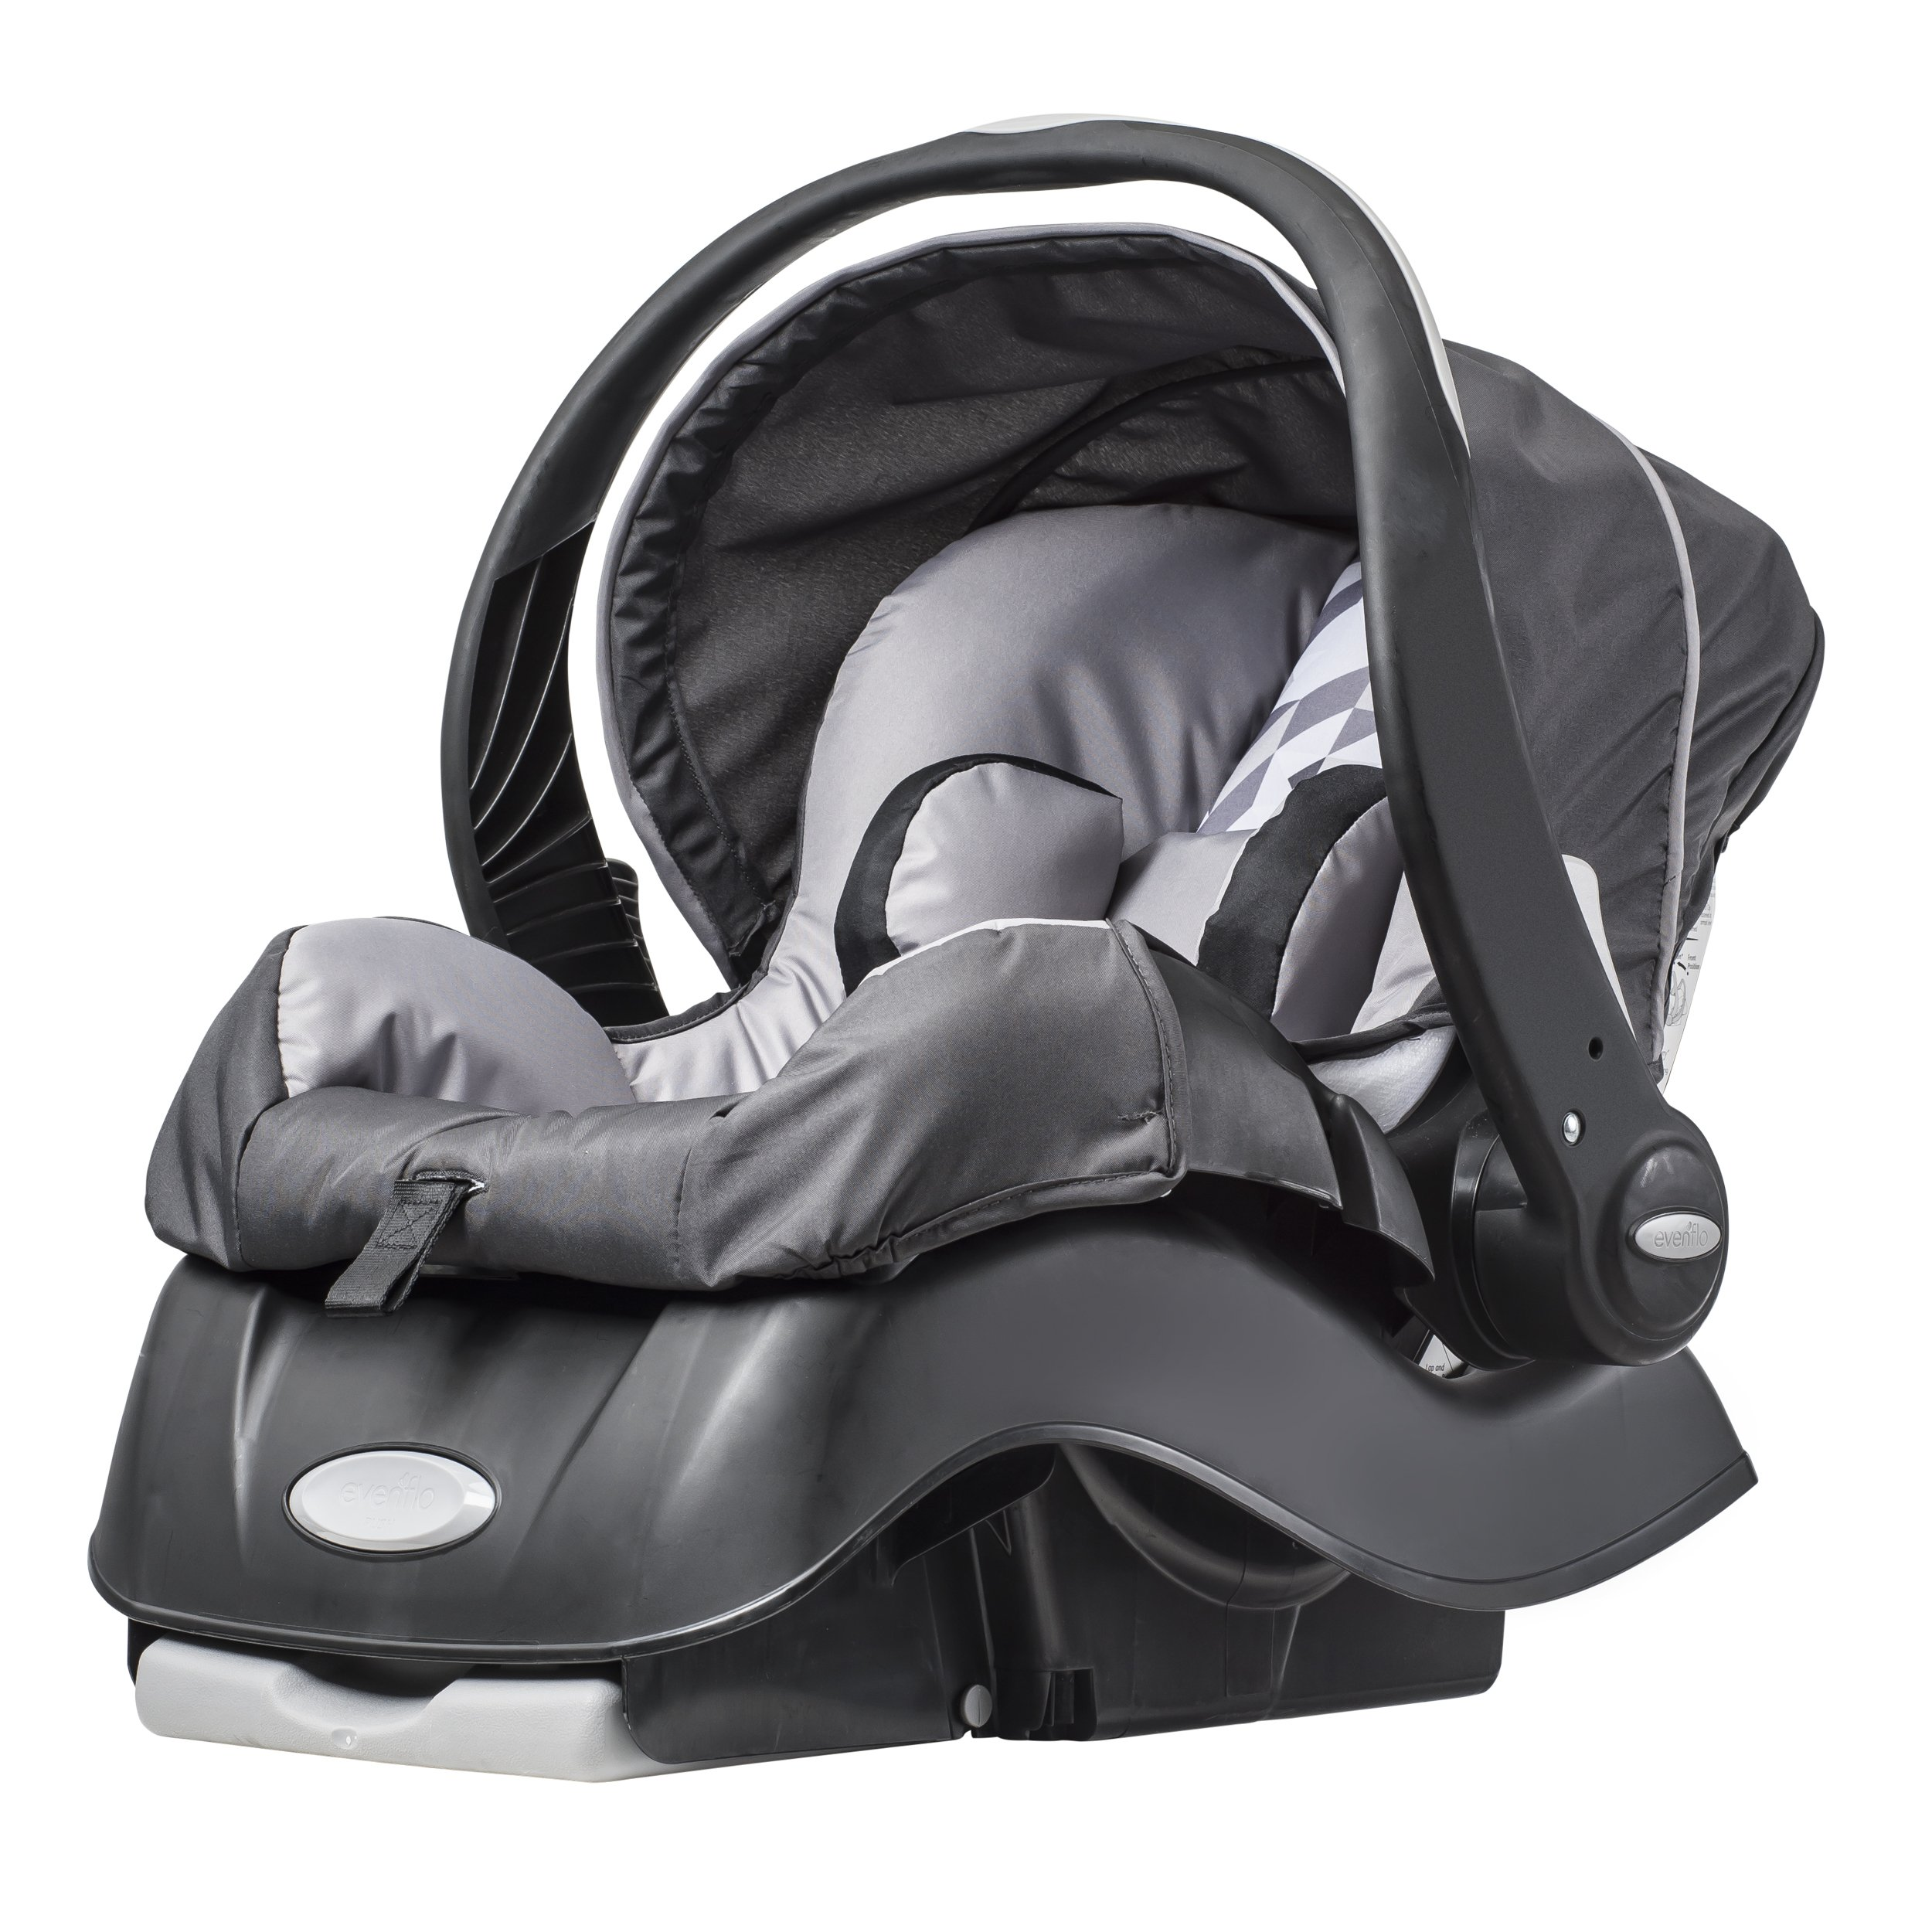 evenflo embrace lx infant car seat raleigh amazon. Black Bedroom Furniture Sets. Home Design Ideas